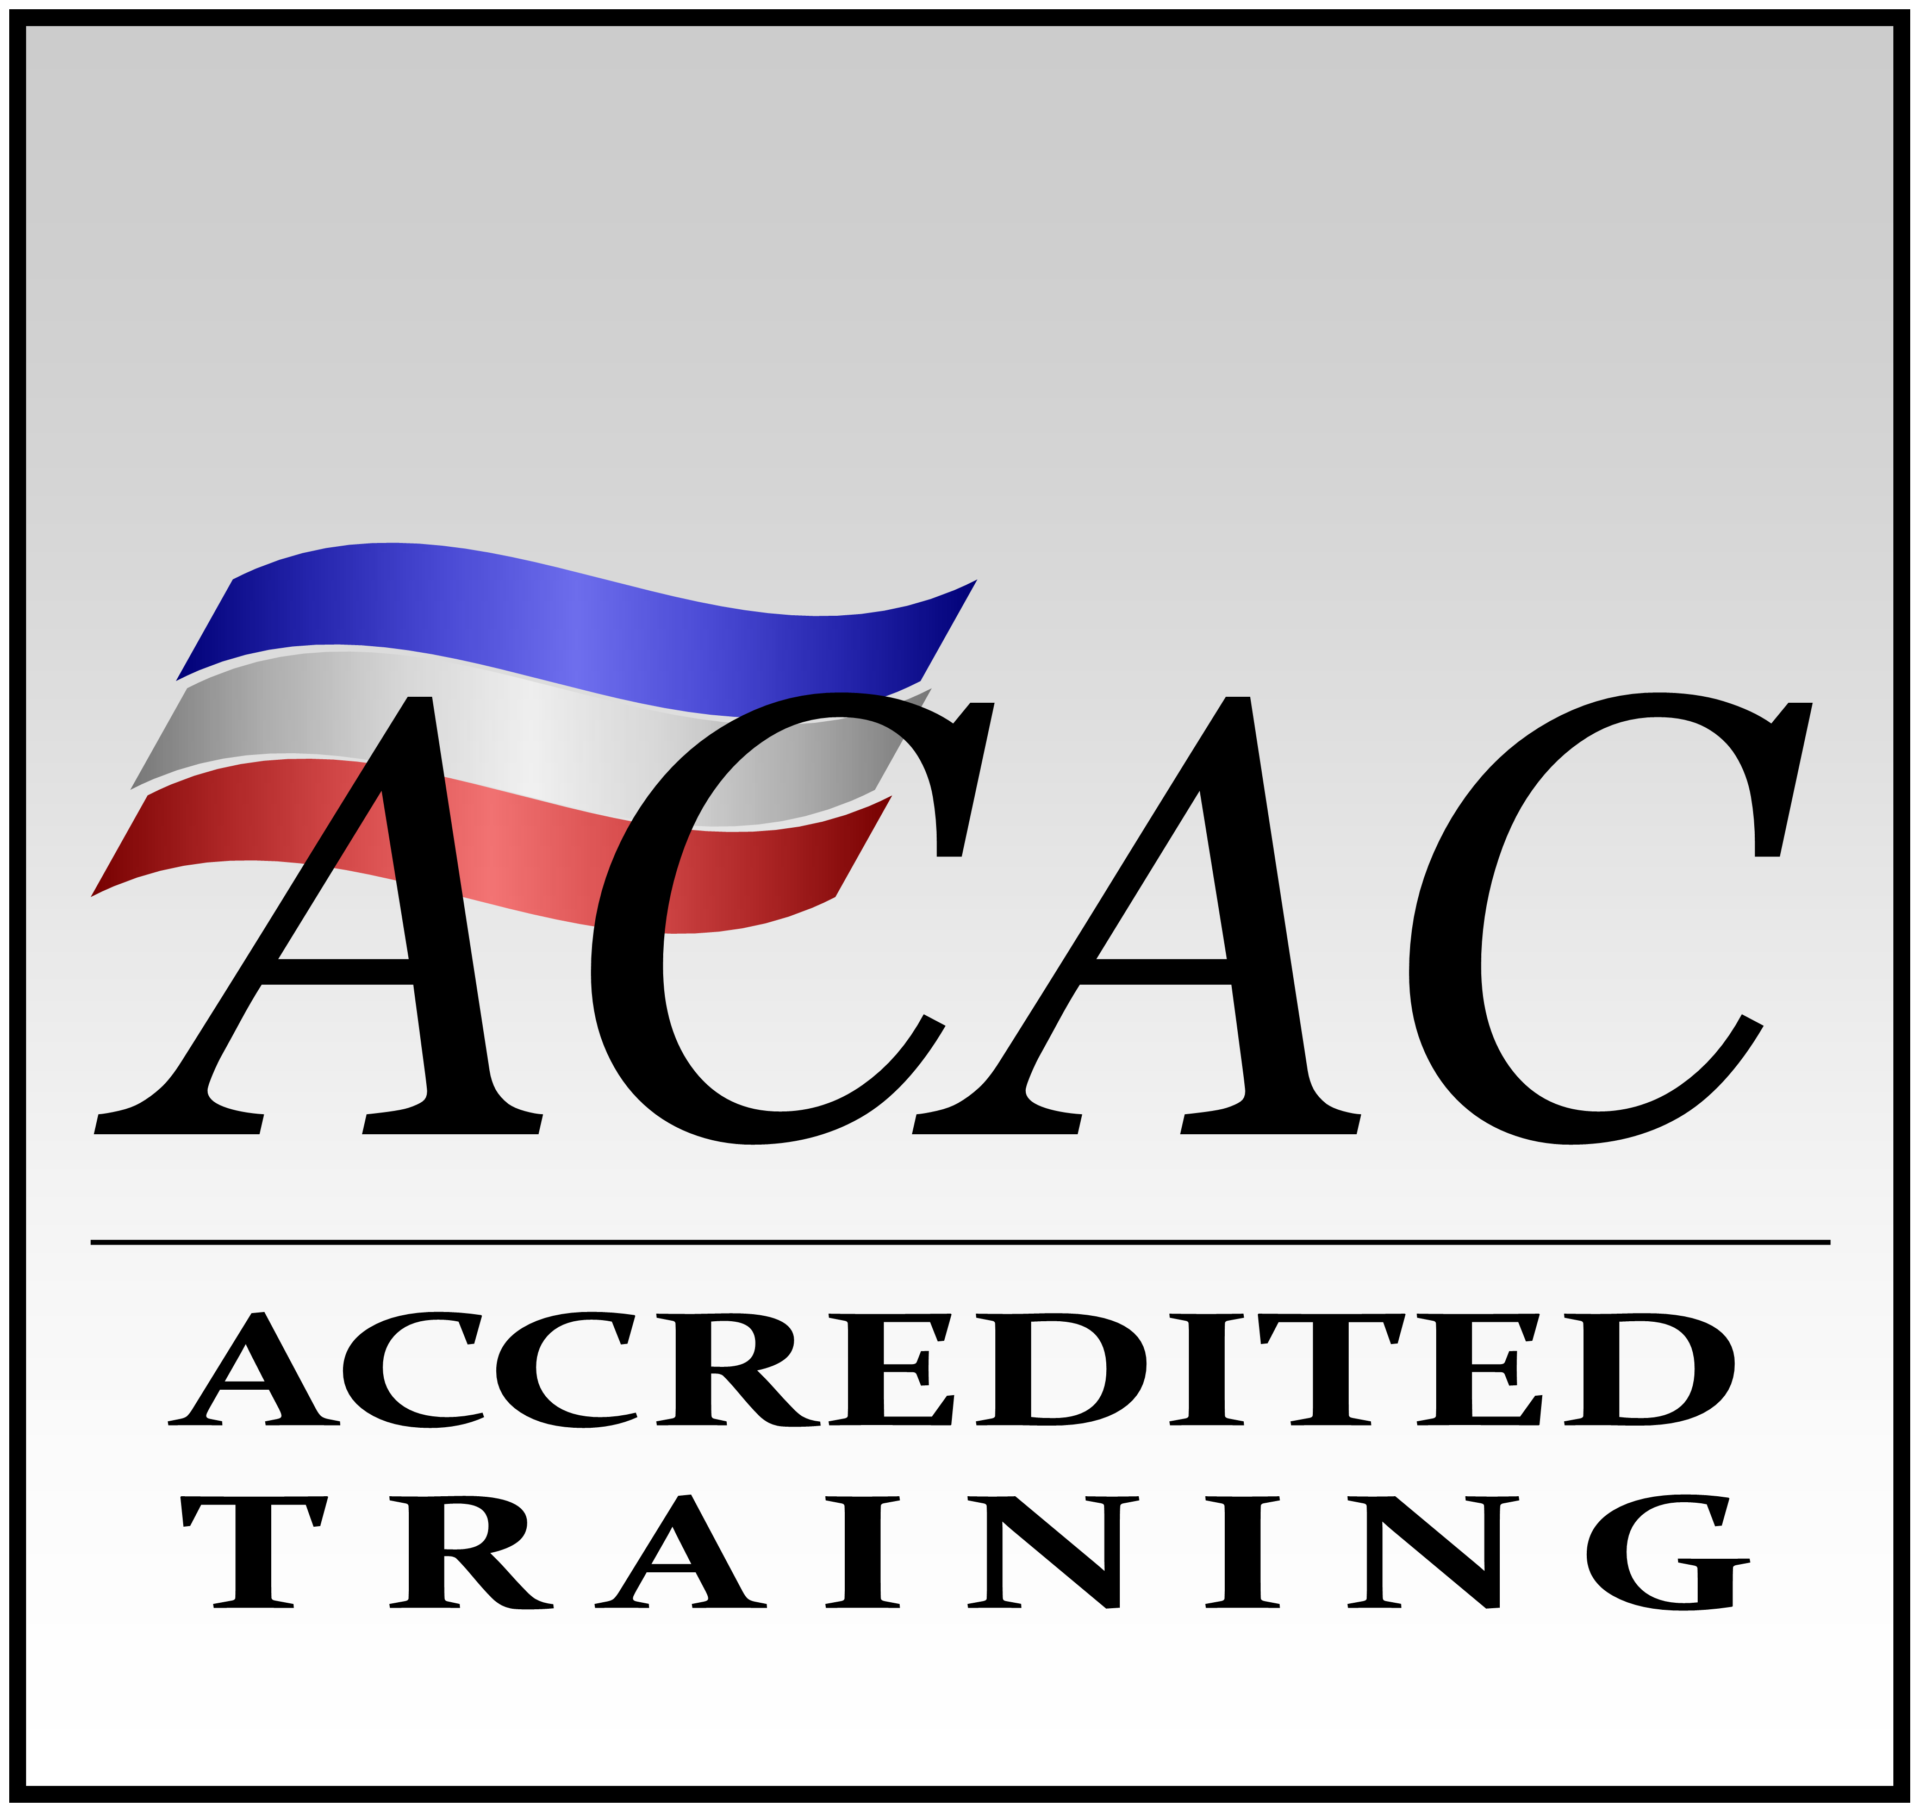 acac-accredited-training